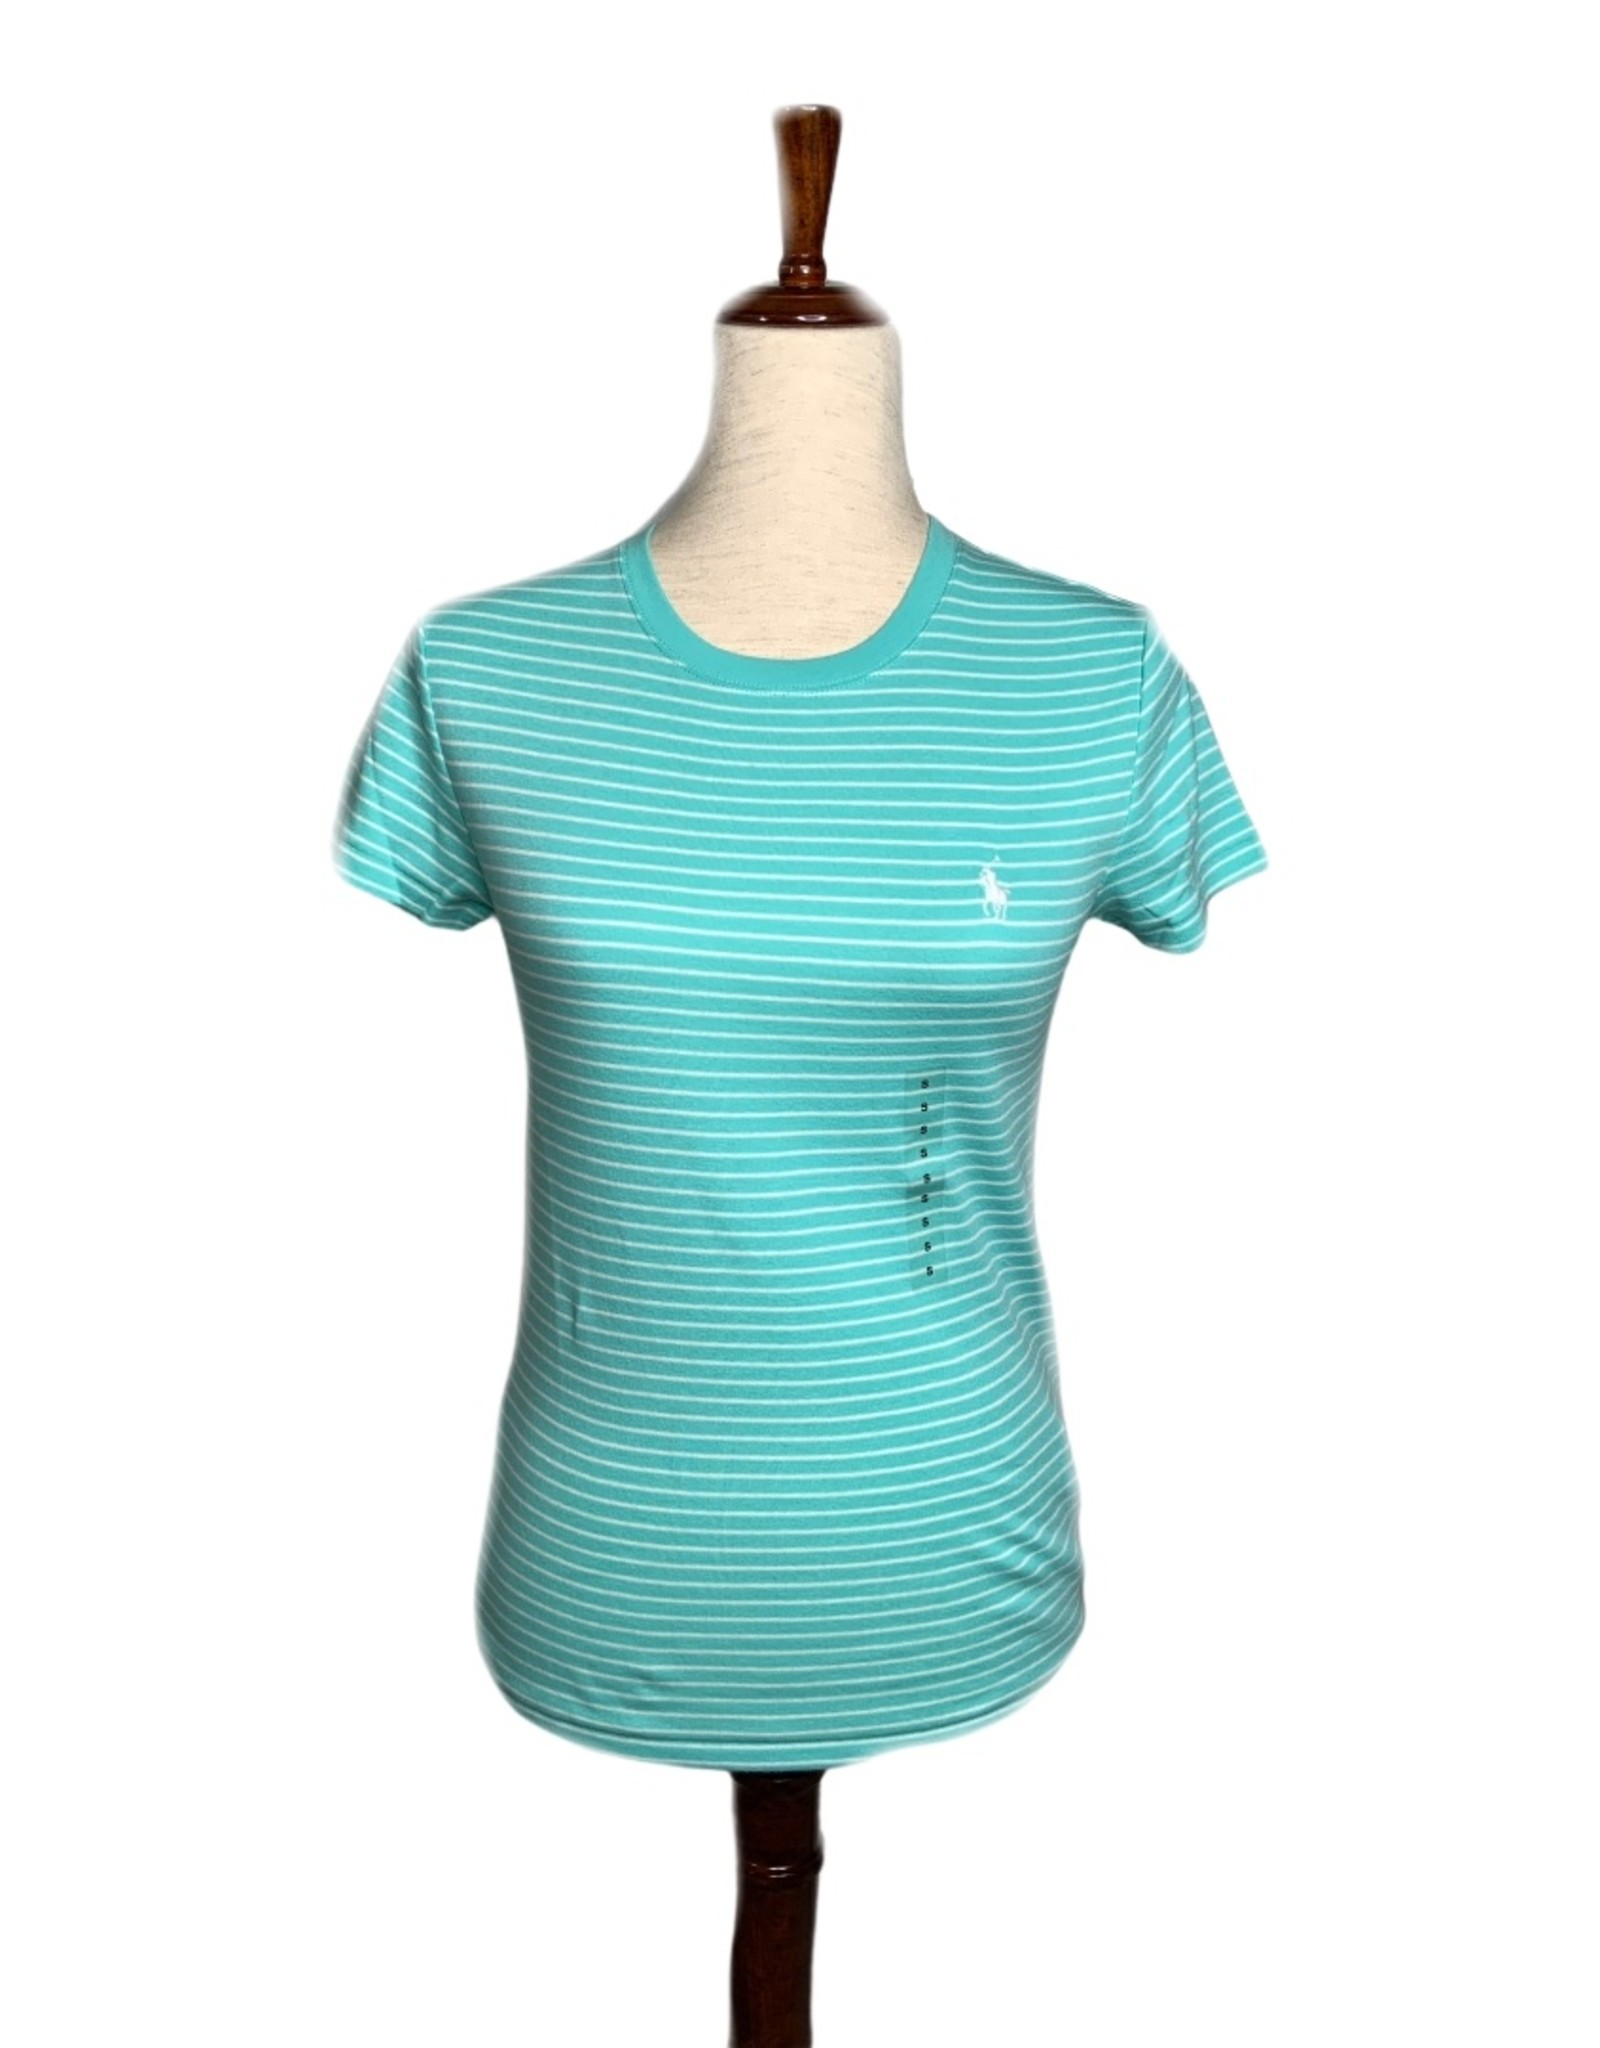 Polo Ralph Lauren Polo Ralph Lauren Tees Short Sleeves Stripes